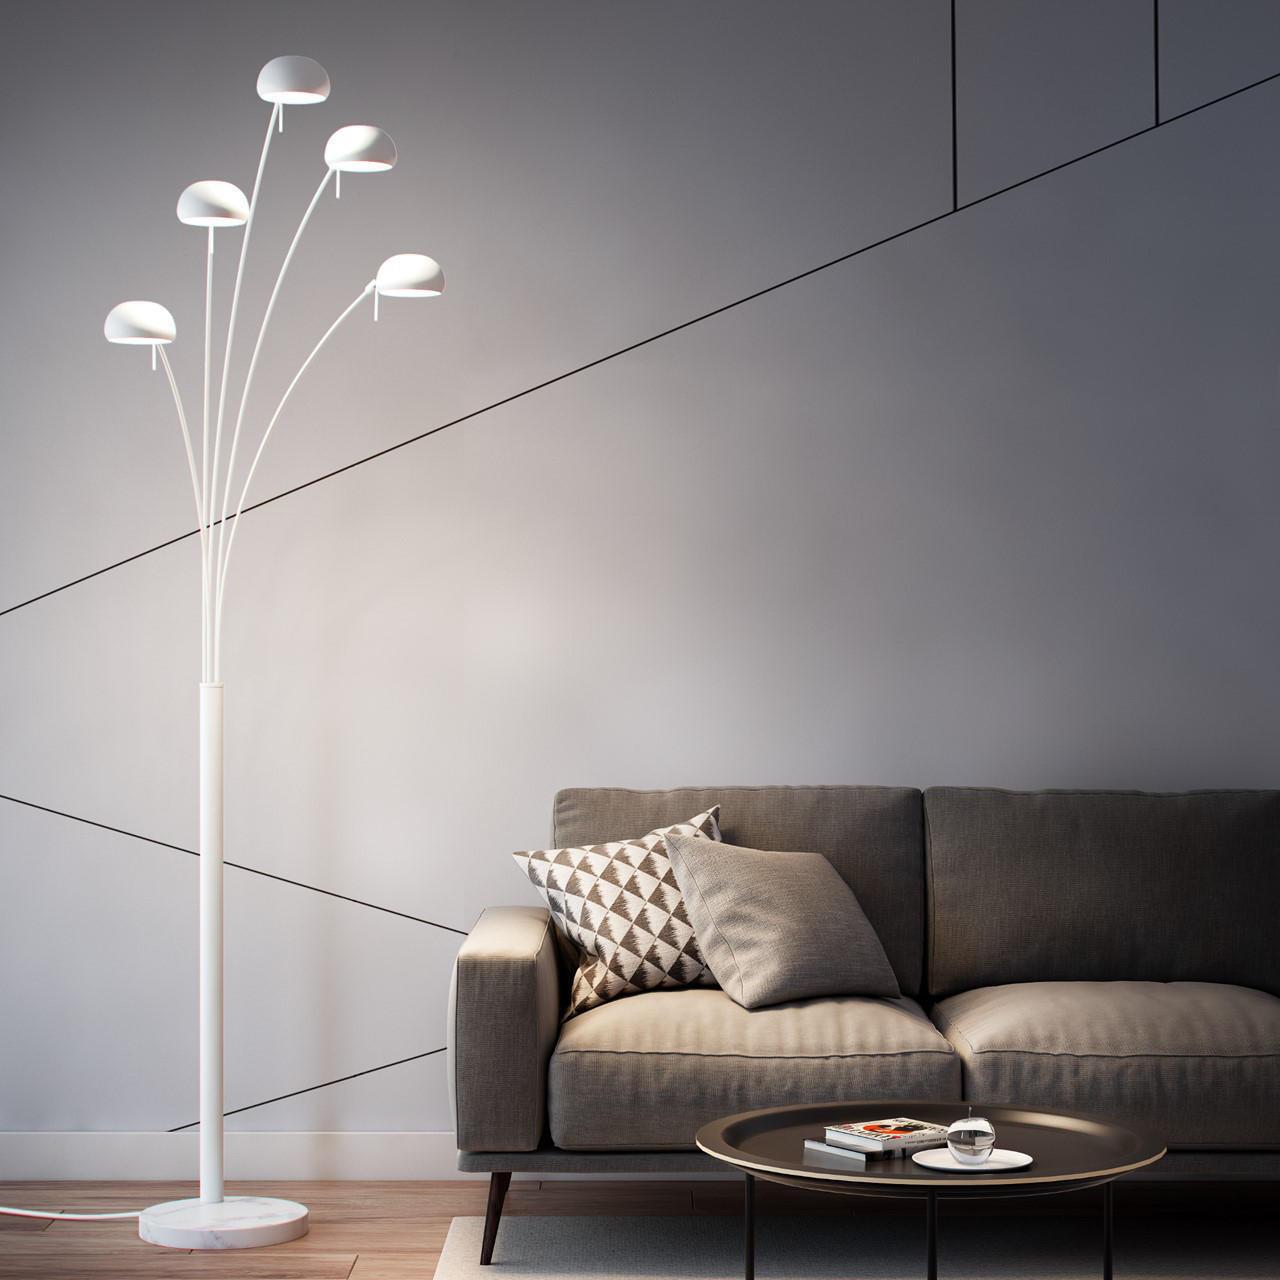 Lampada da terra in metallo, H224.0cm, E14 5xINSPIRE - 4